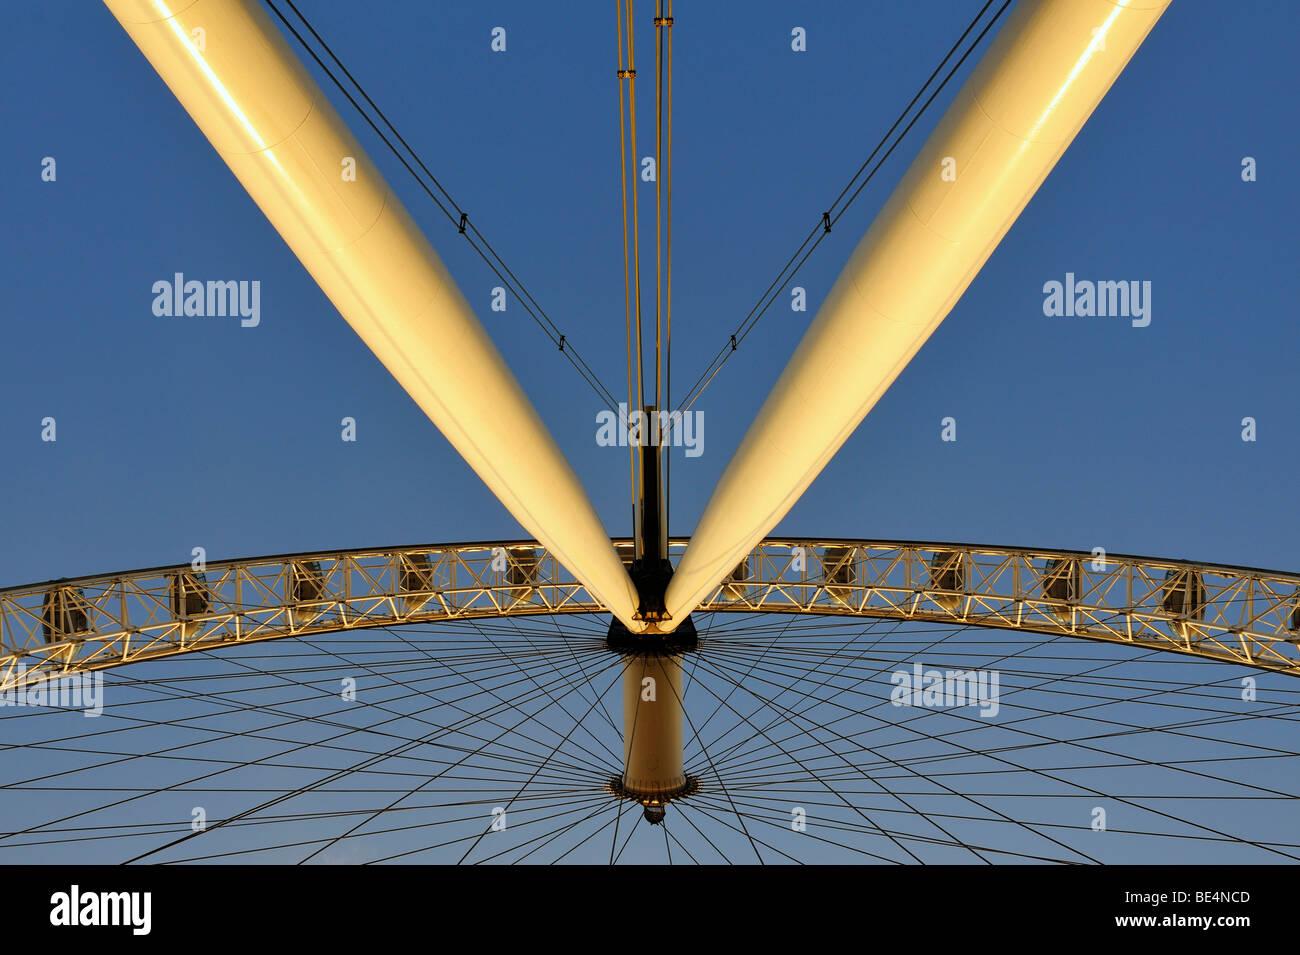 Detail of the London Eye or Millennium Wheel, London, England, United Kingdom, Europe Stock Photo